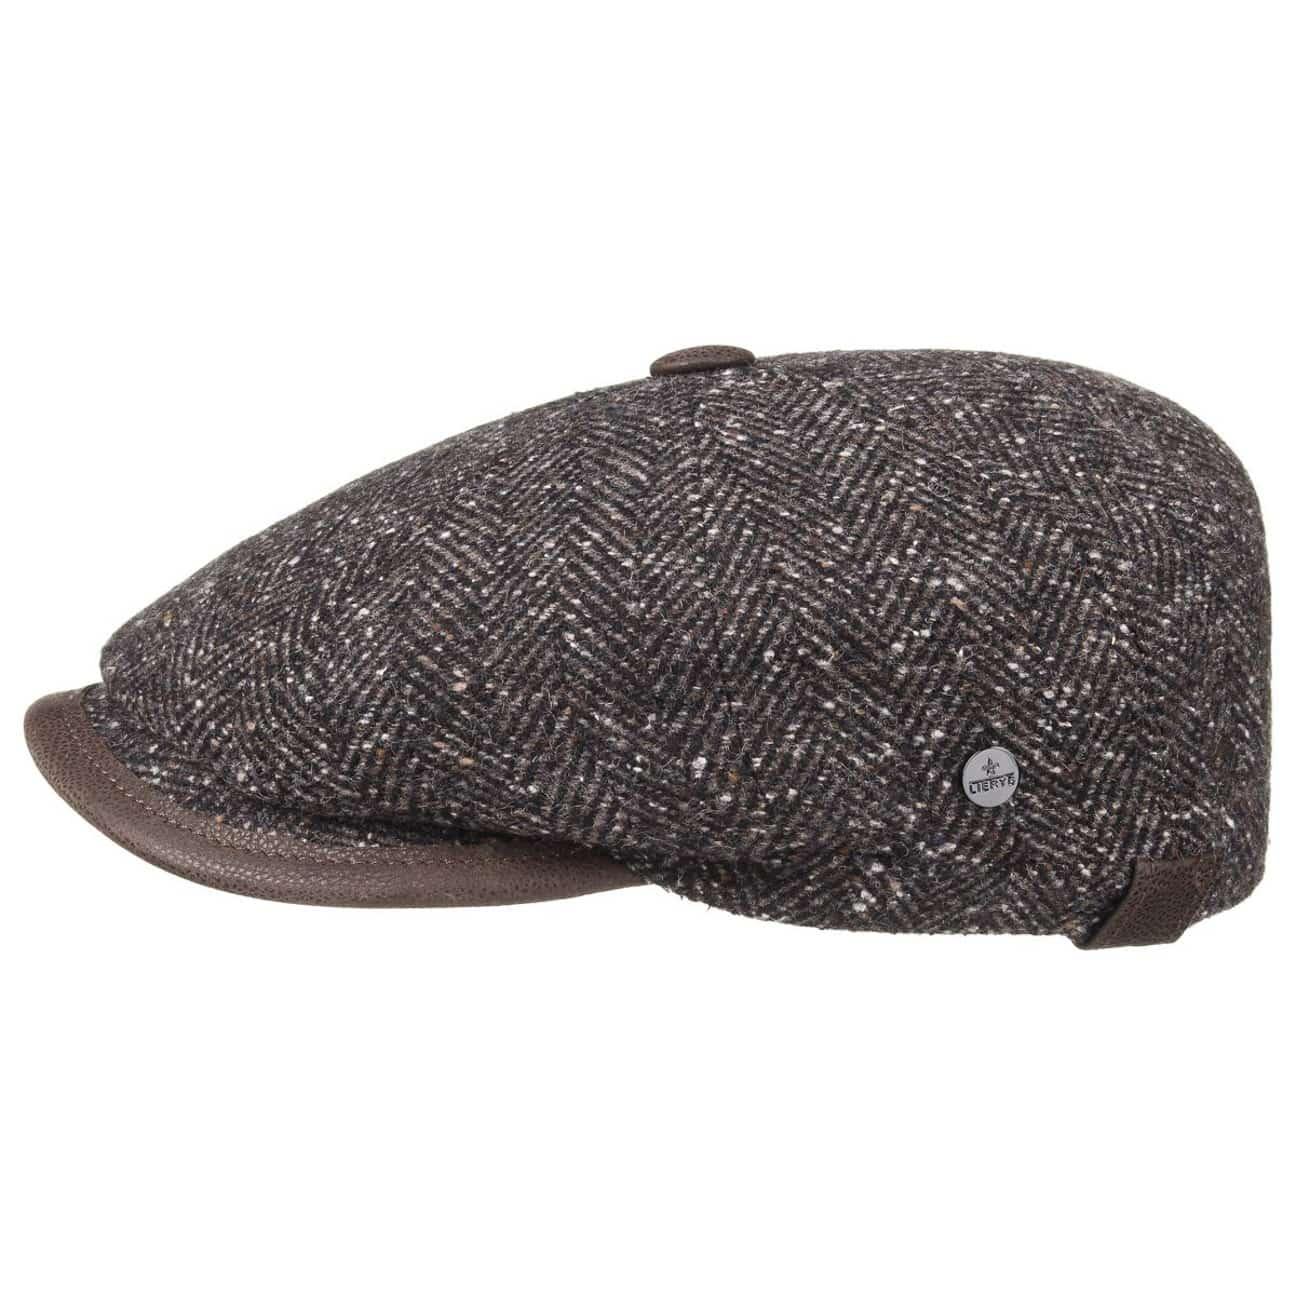 ... Cortino Herringbone Flat Cap by Lierys - brown 4 ... 6c9087a418d